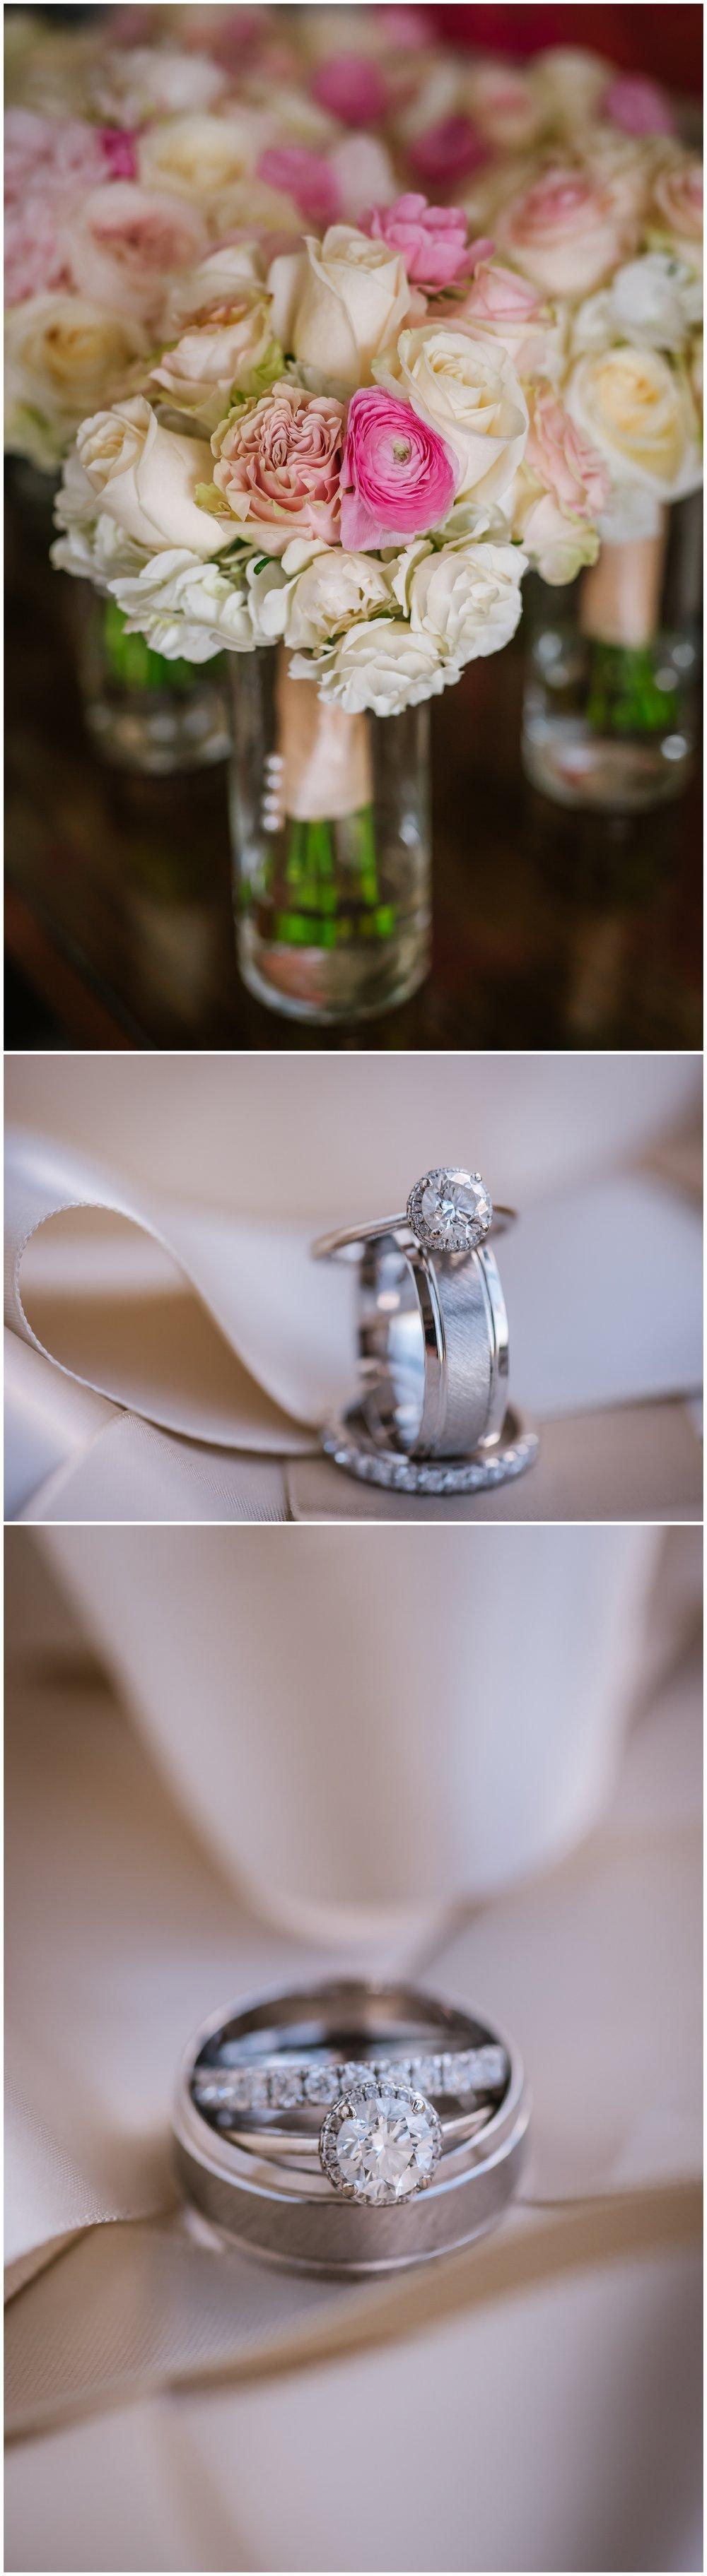 Sarasota-wedding-photographer-hyatt-regency-blush_0009.jpg